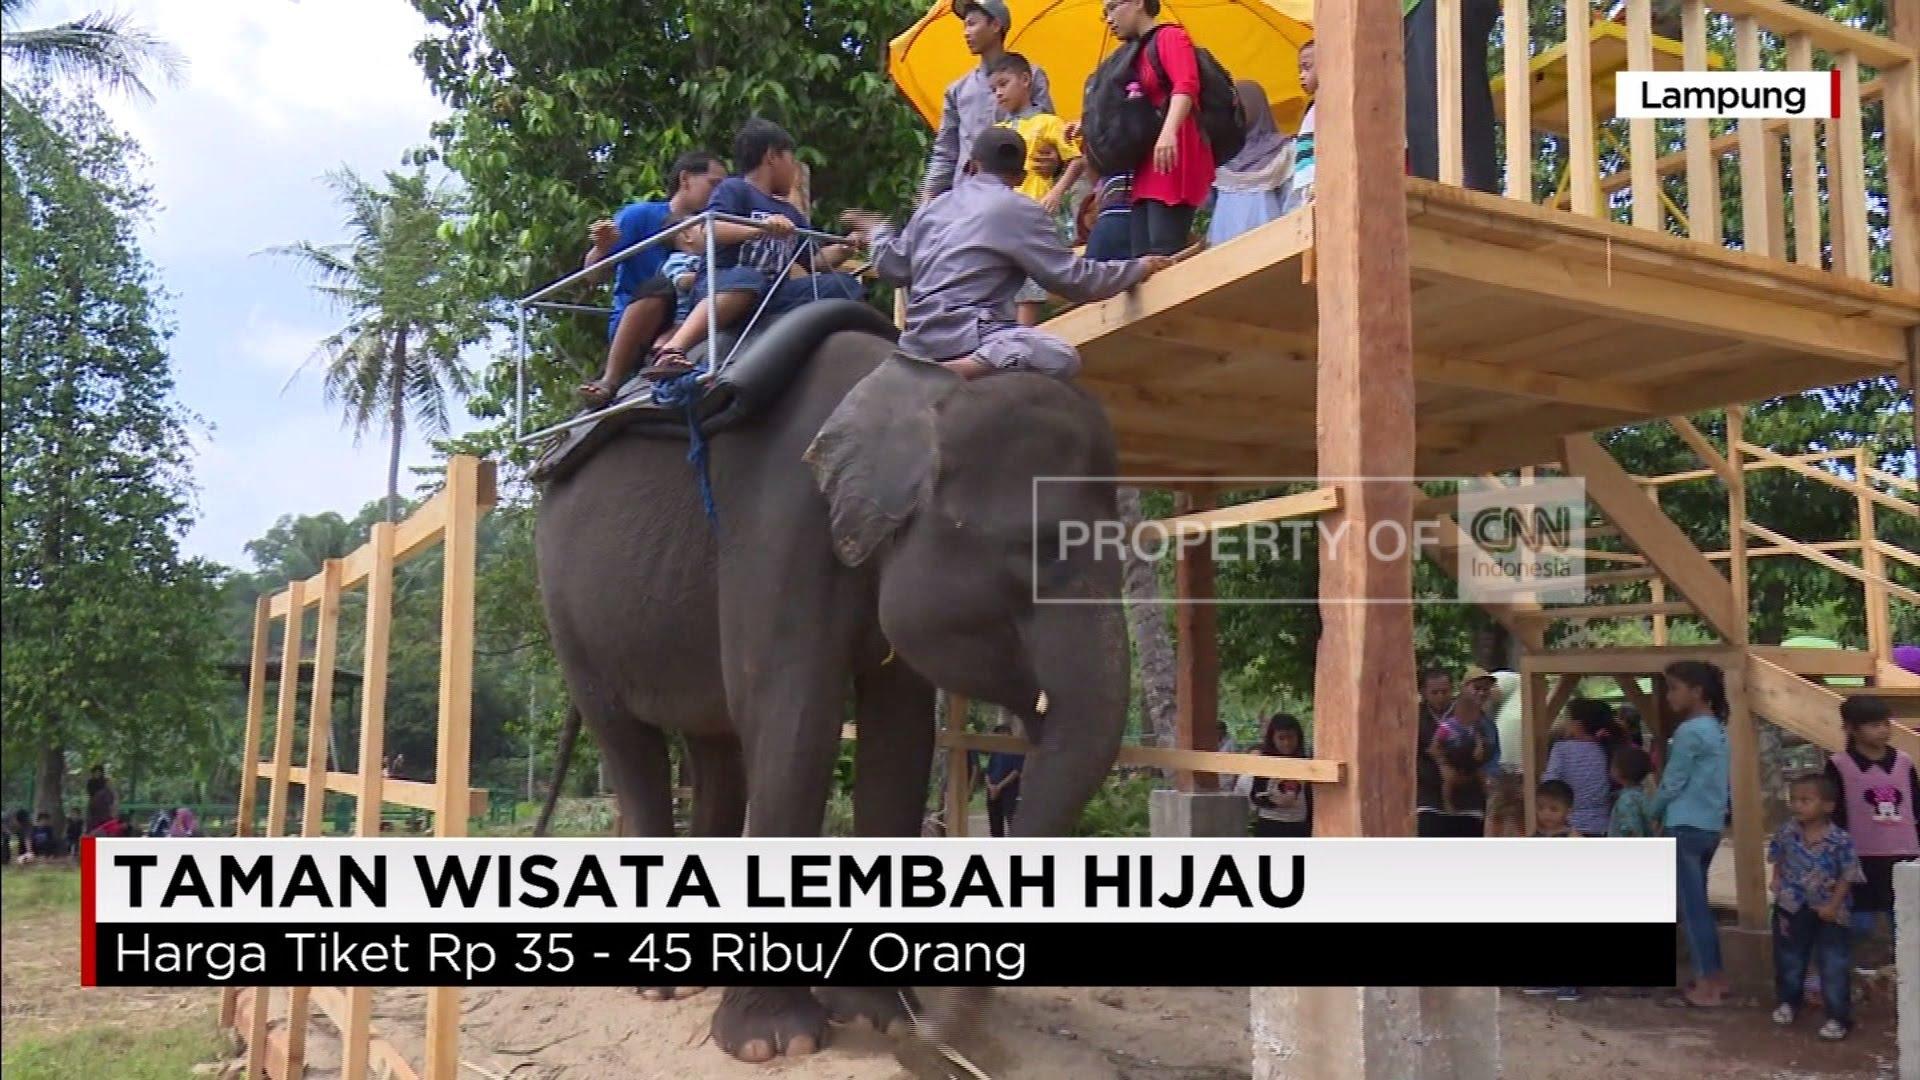 Tunggang Gajah Taman Wisata Lembah Hijau Youtube Lampung Kota Bandar